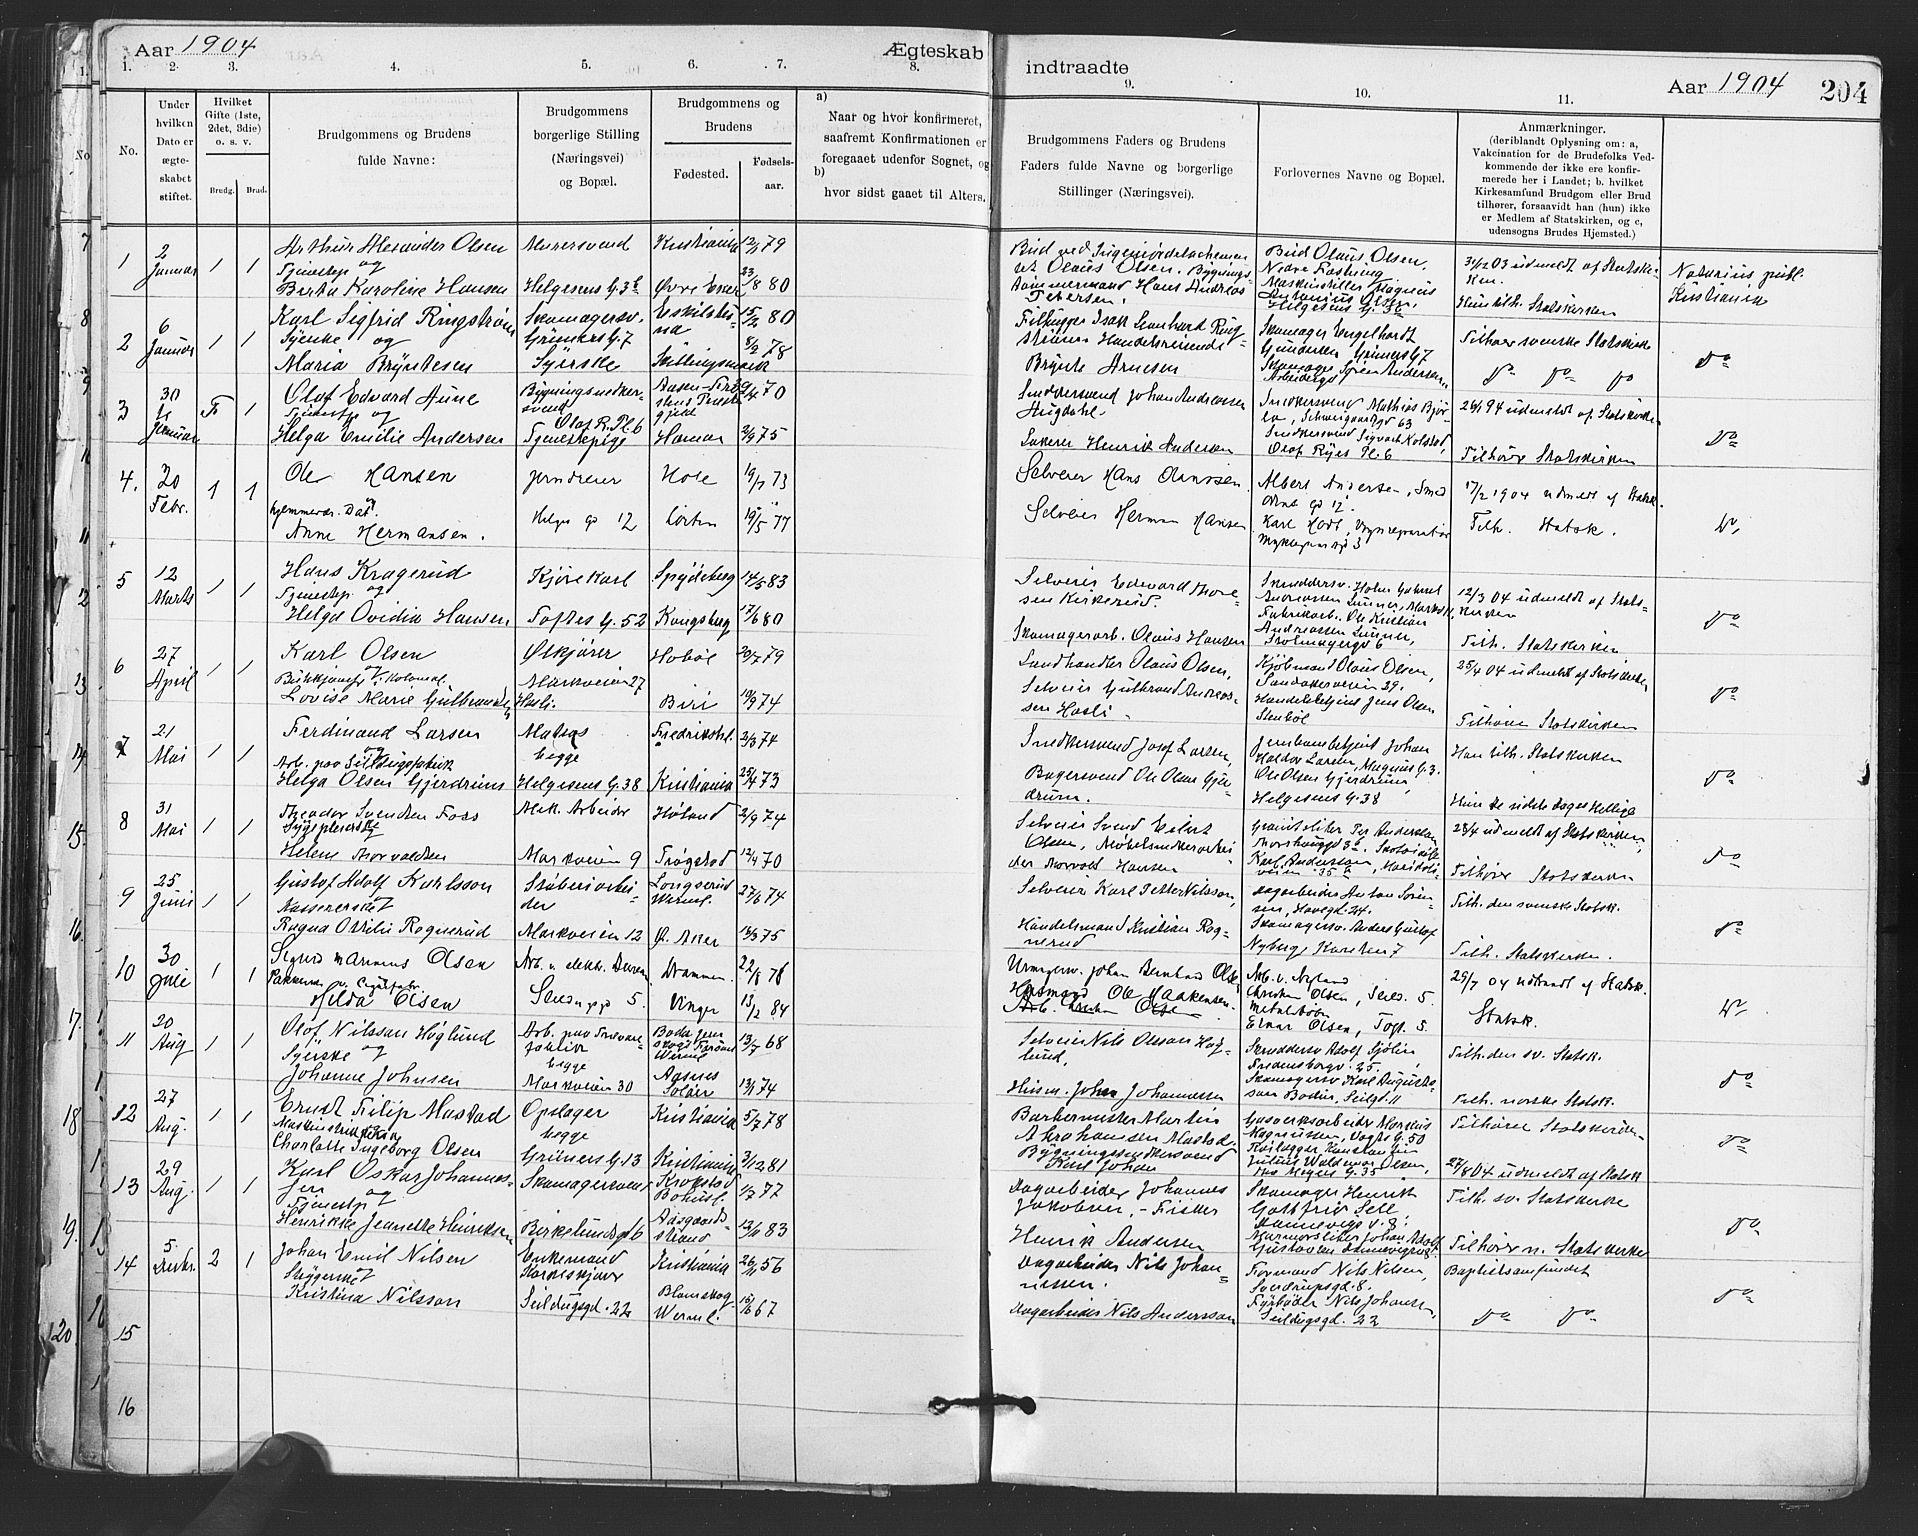 SAO, Paulus prestekontor Kirkebøker, F/Fa/L0012: Ministerialbok nr. 12, 1897-1908, s. 204